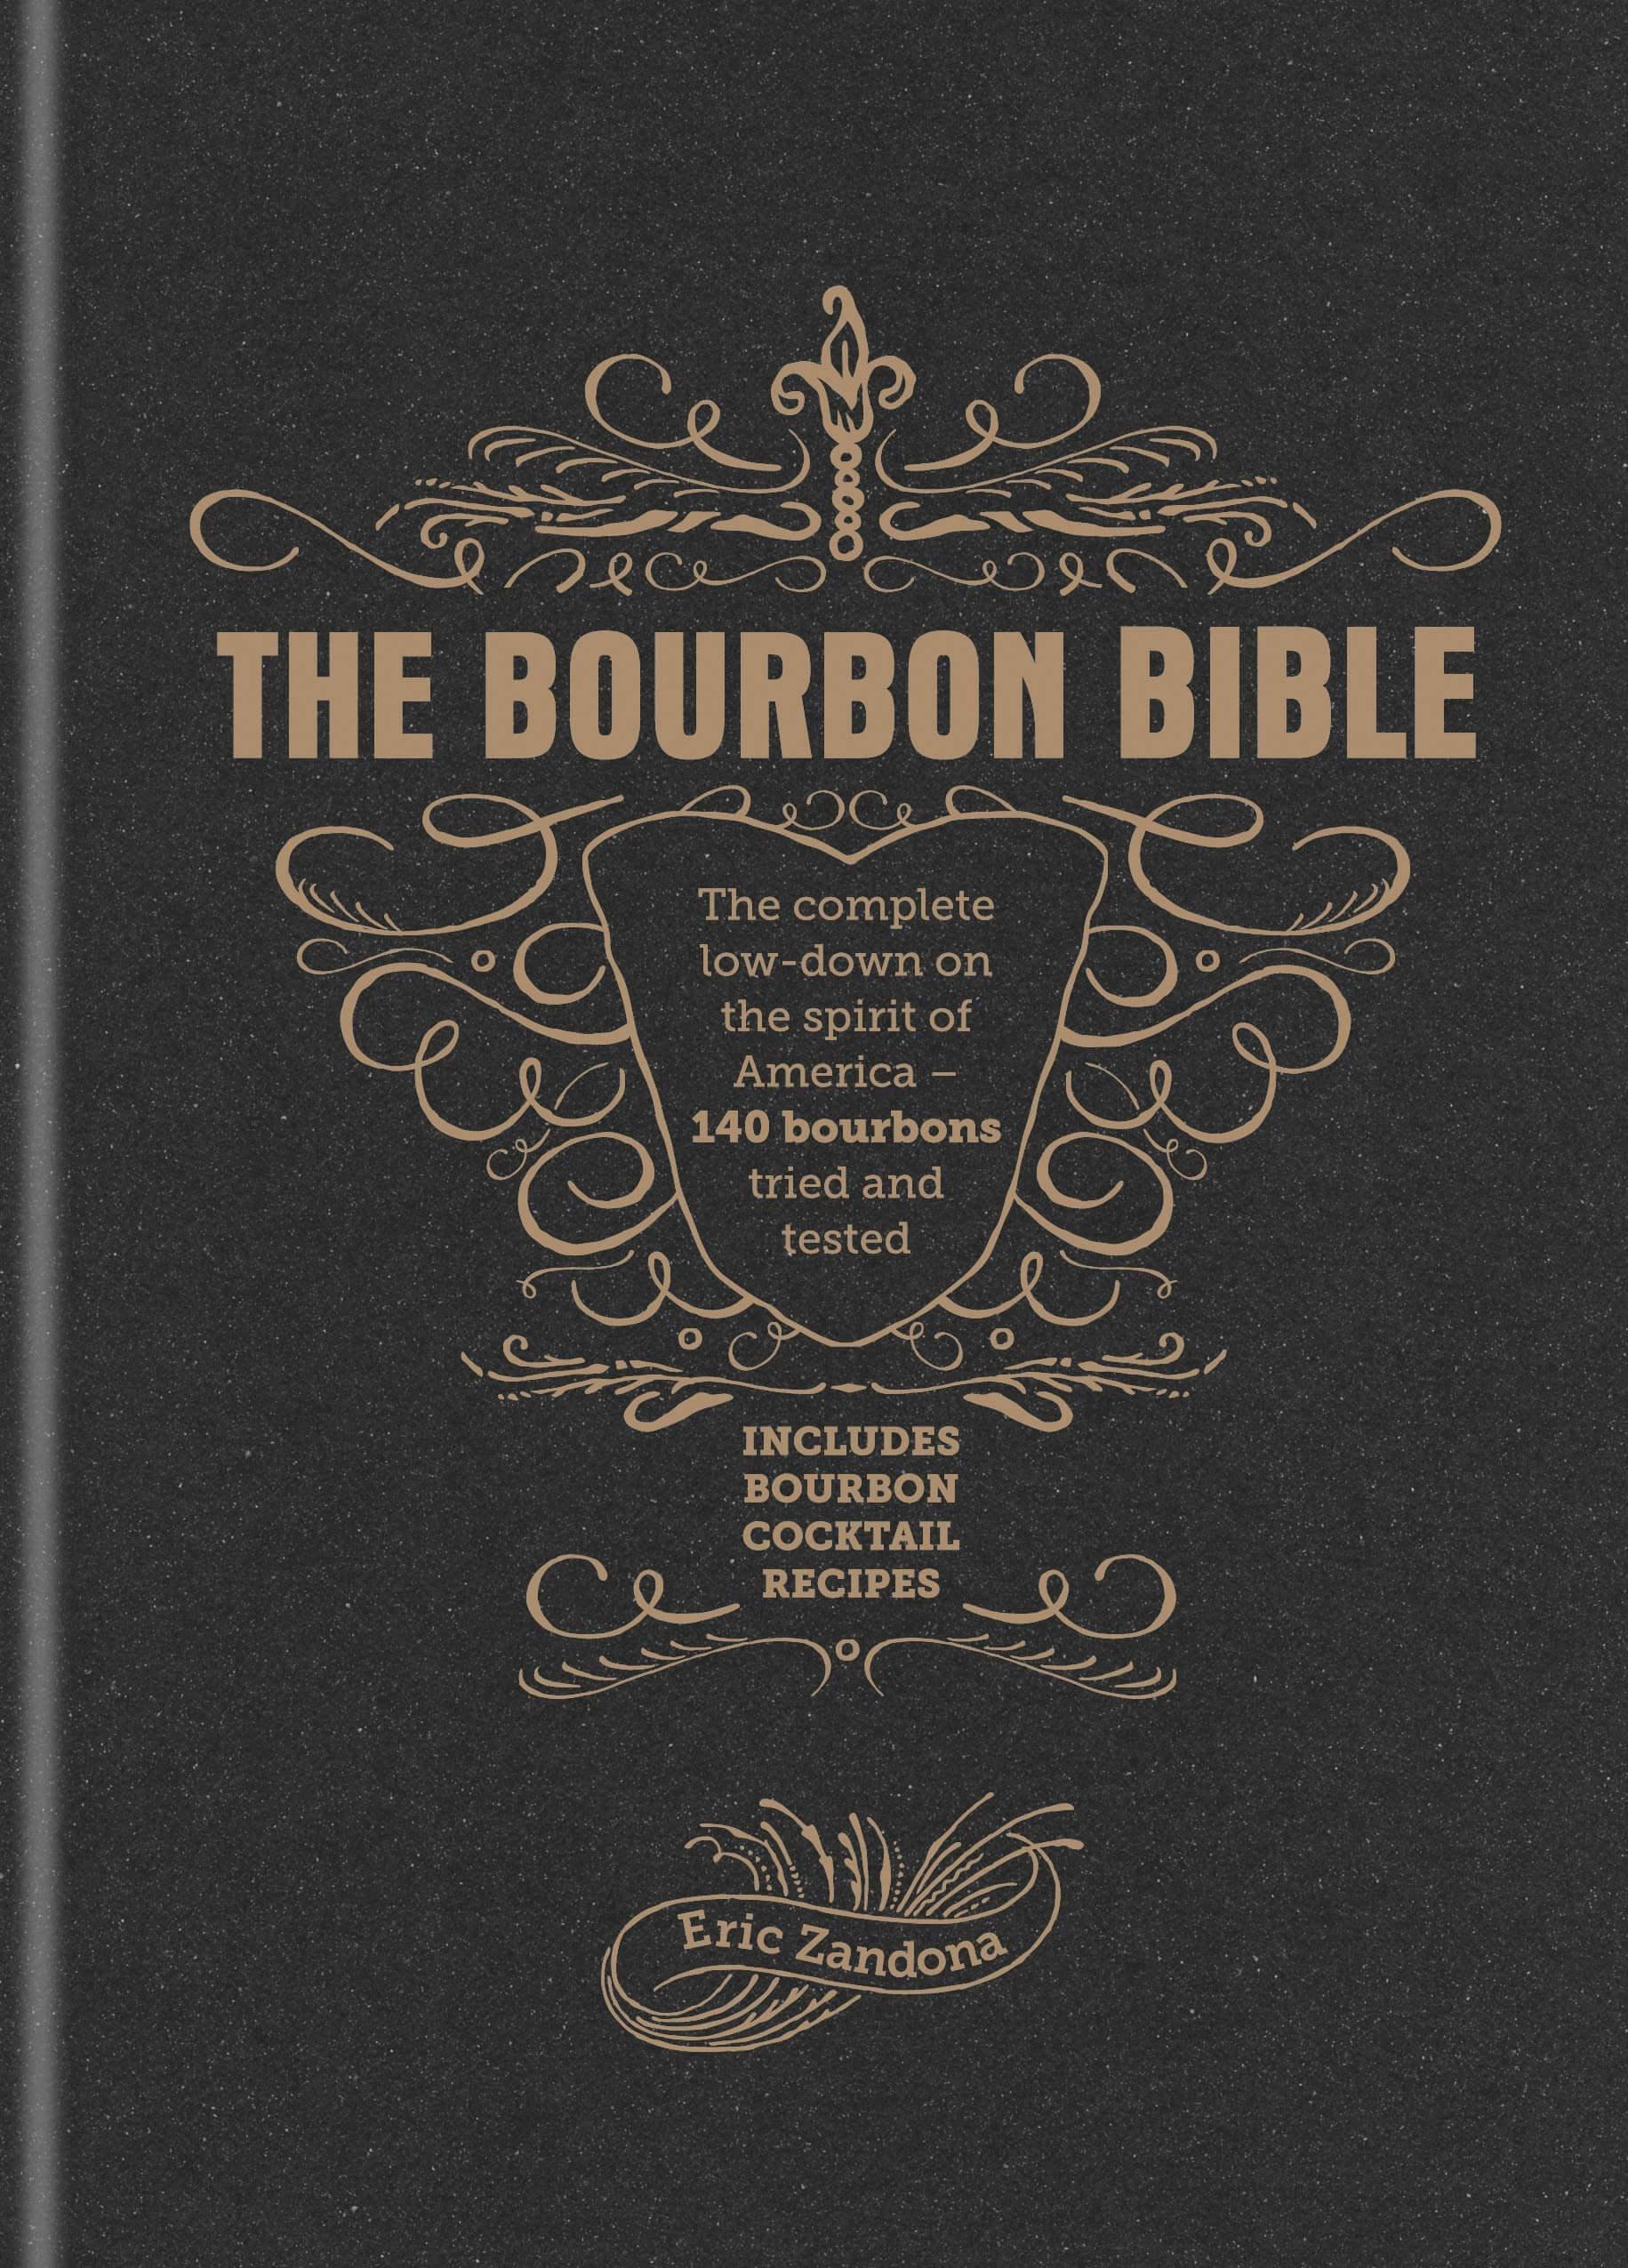 The Bourbon Bible by Eric Zandona Hardcover